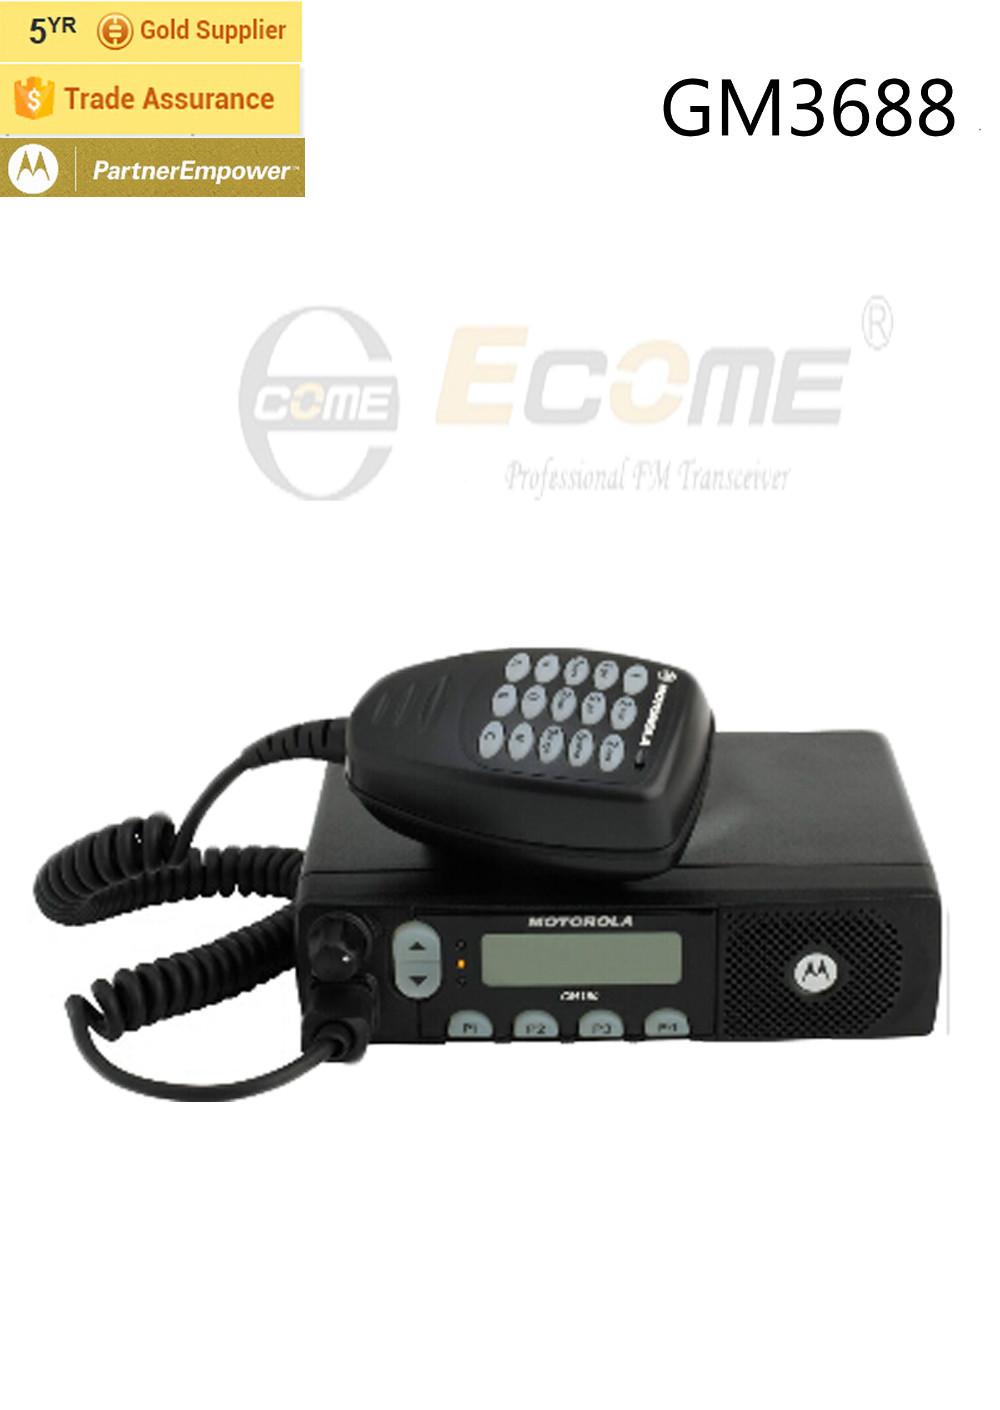 Aliexpress Comprar Caliente Venta GM3688 Profesional